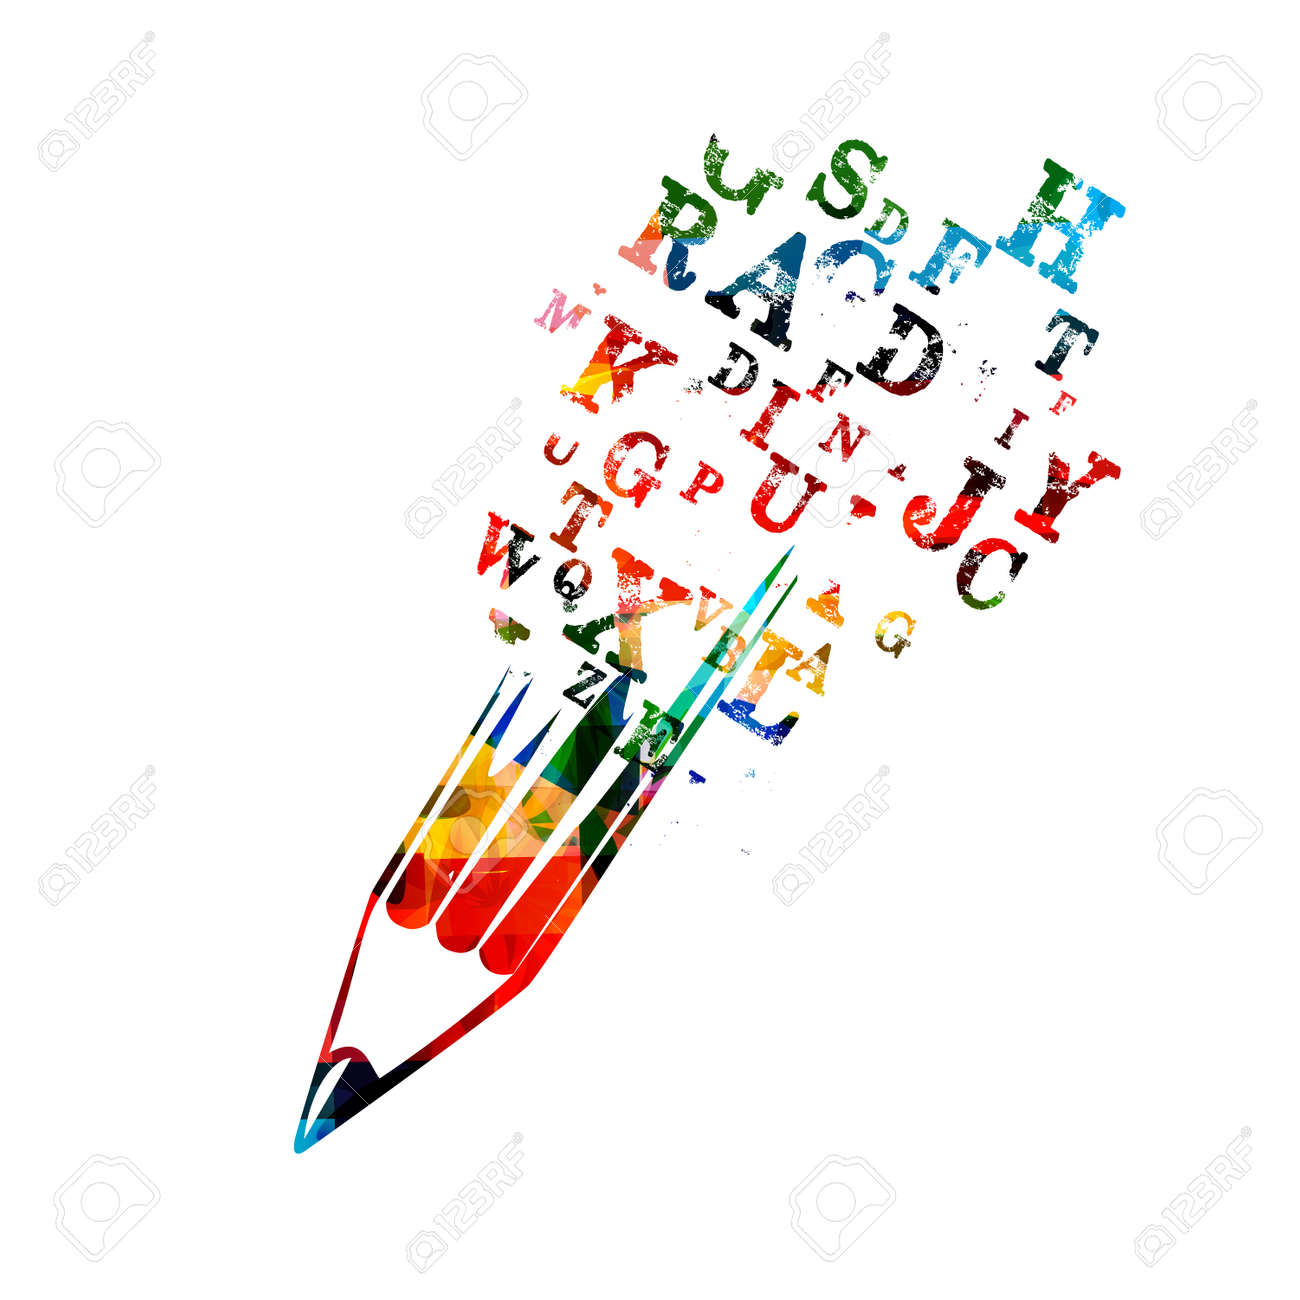 Creative writing concept - 35808516